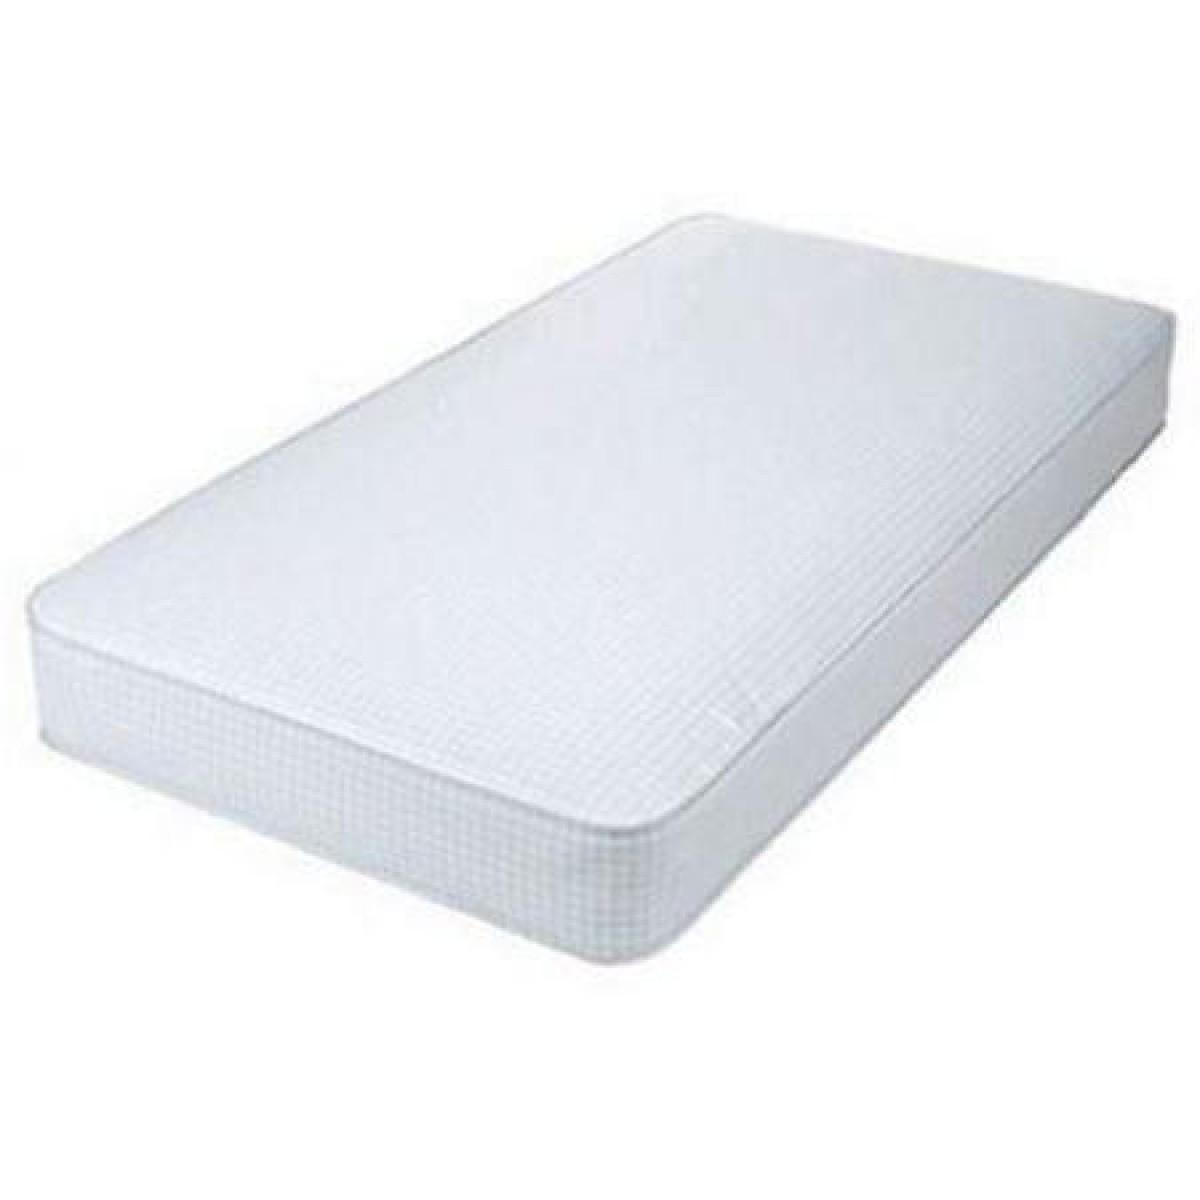 trendy trundle mattress 3ft single 90 x 190 cm. Black Bedroom Furniture Sets. Home Design Ideas